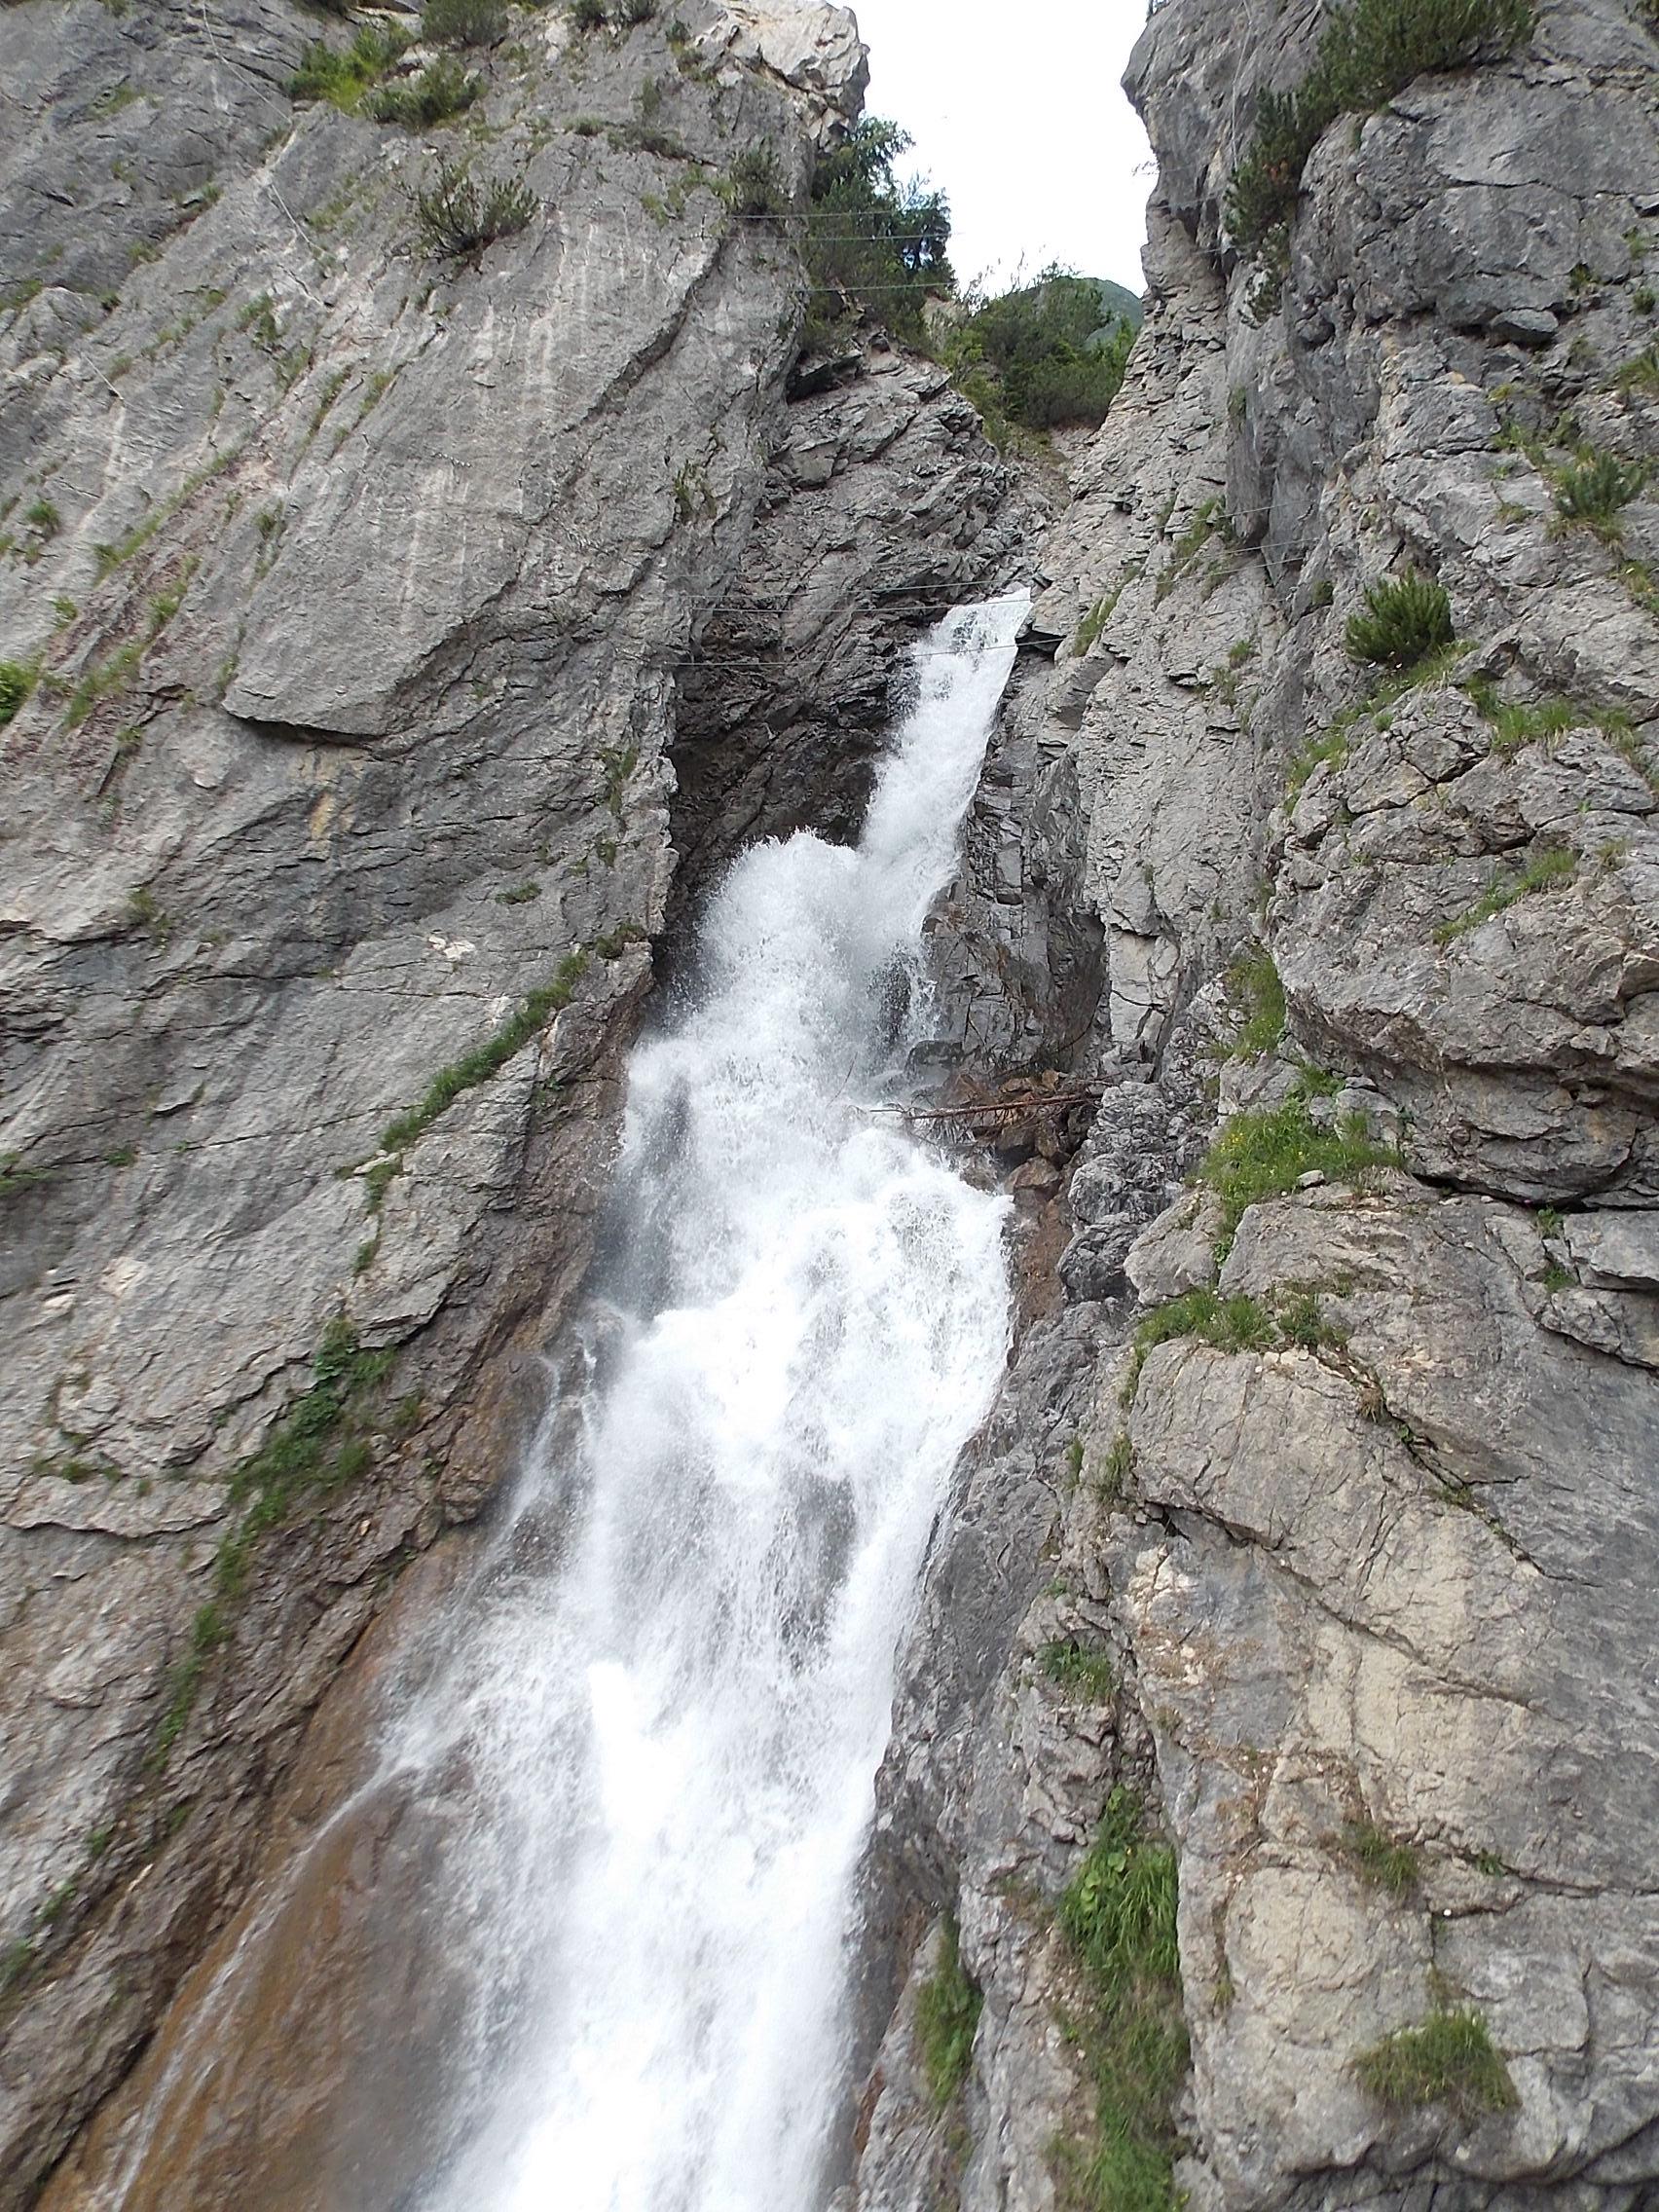 Simmswasserfall Holzgau Lechweg 5